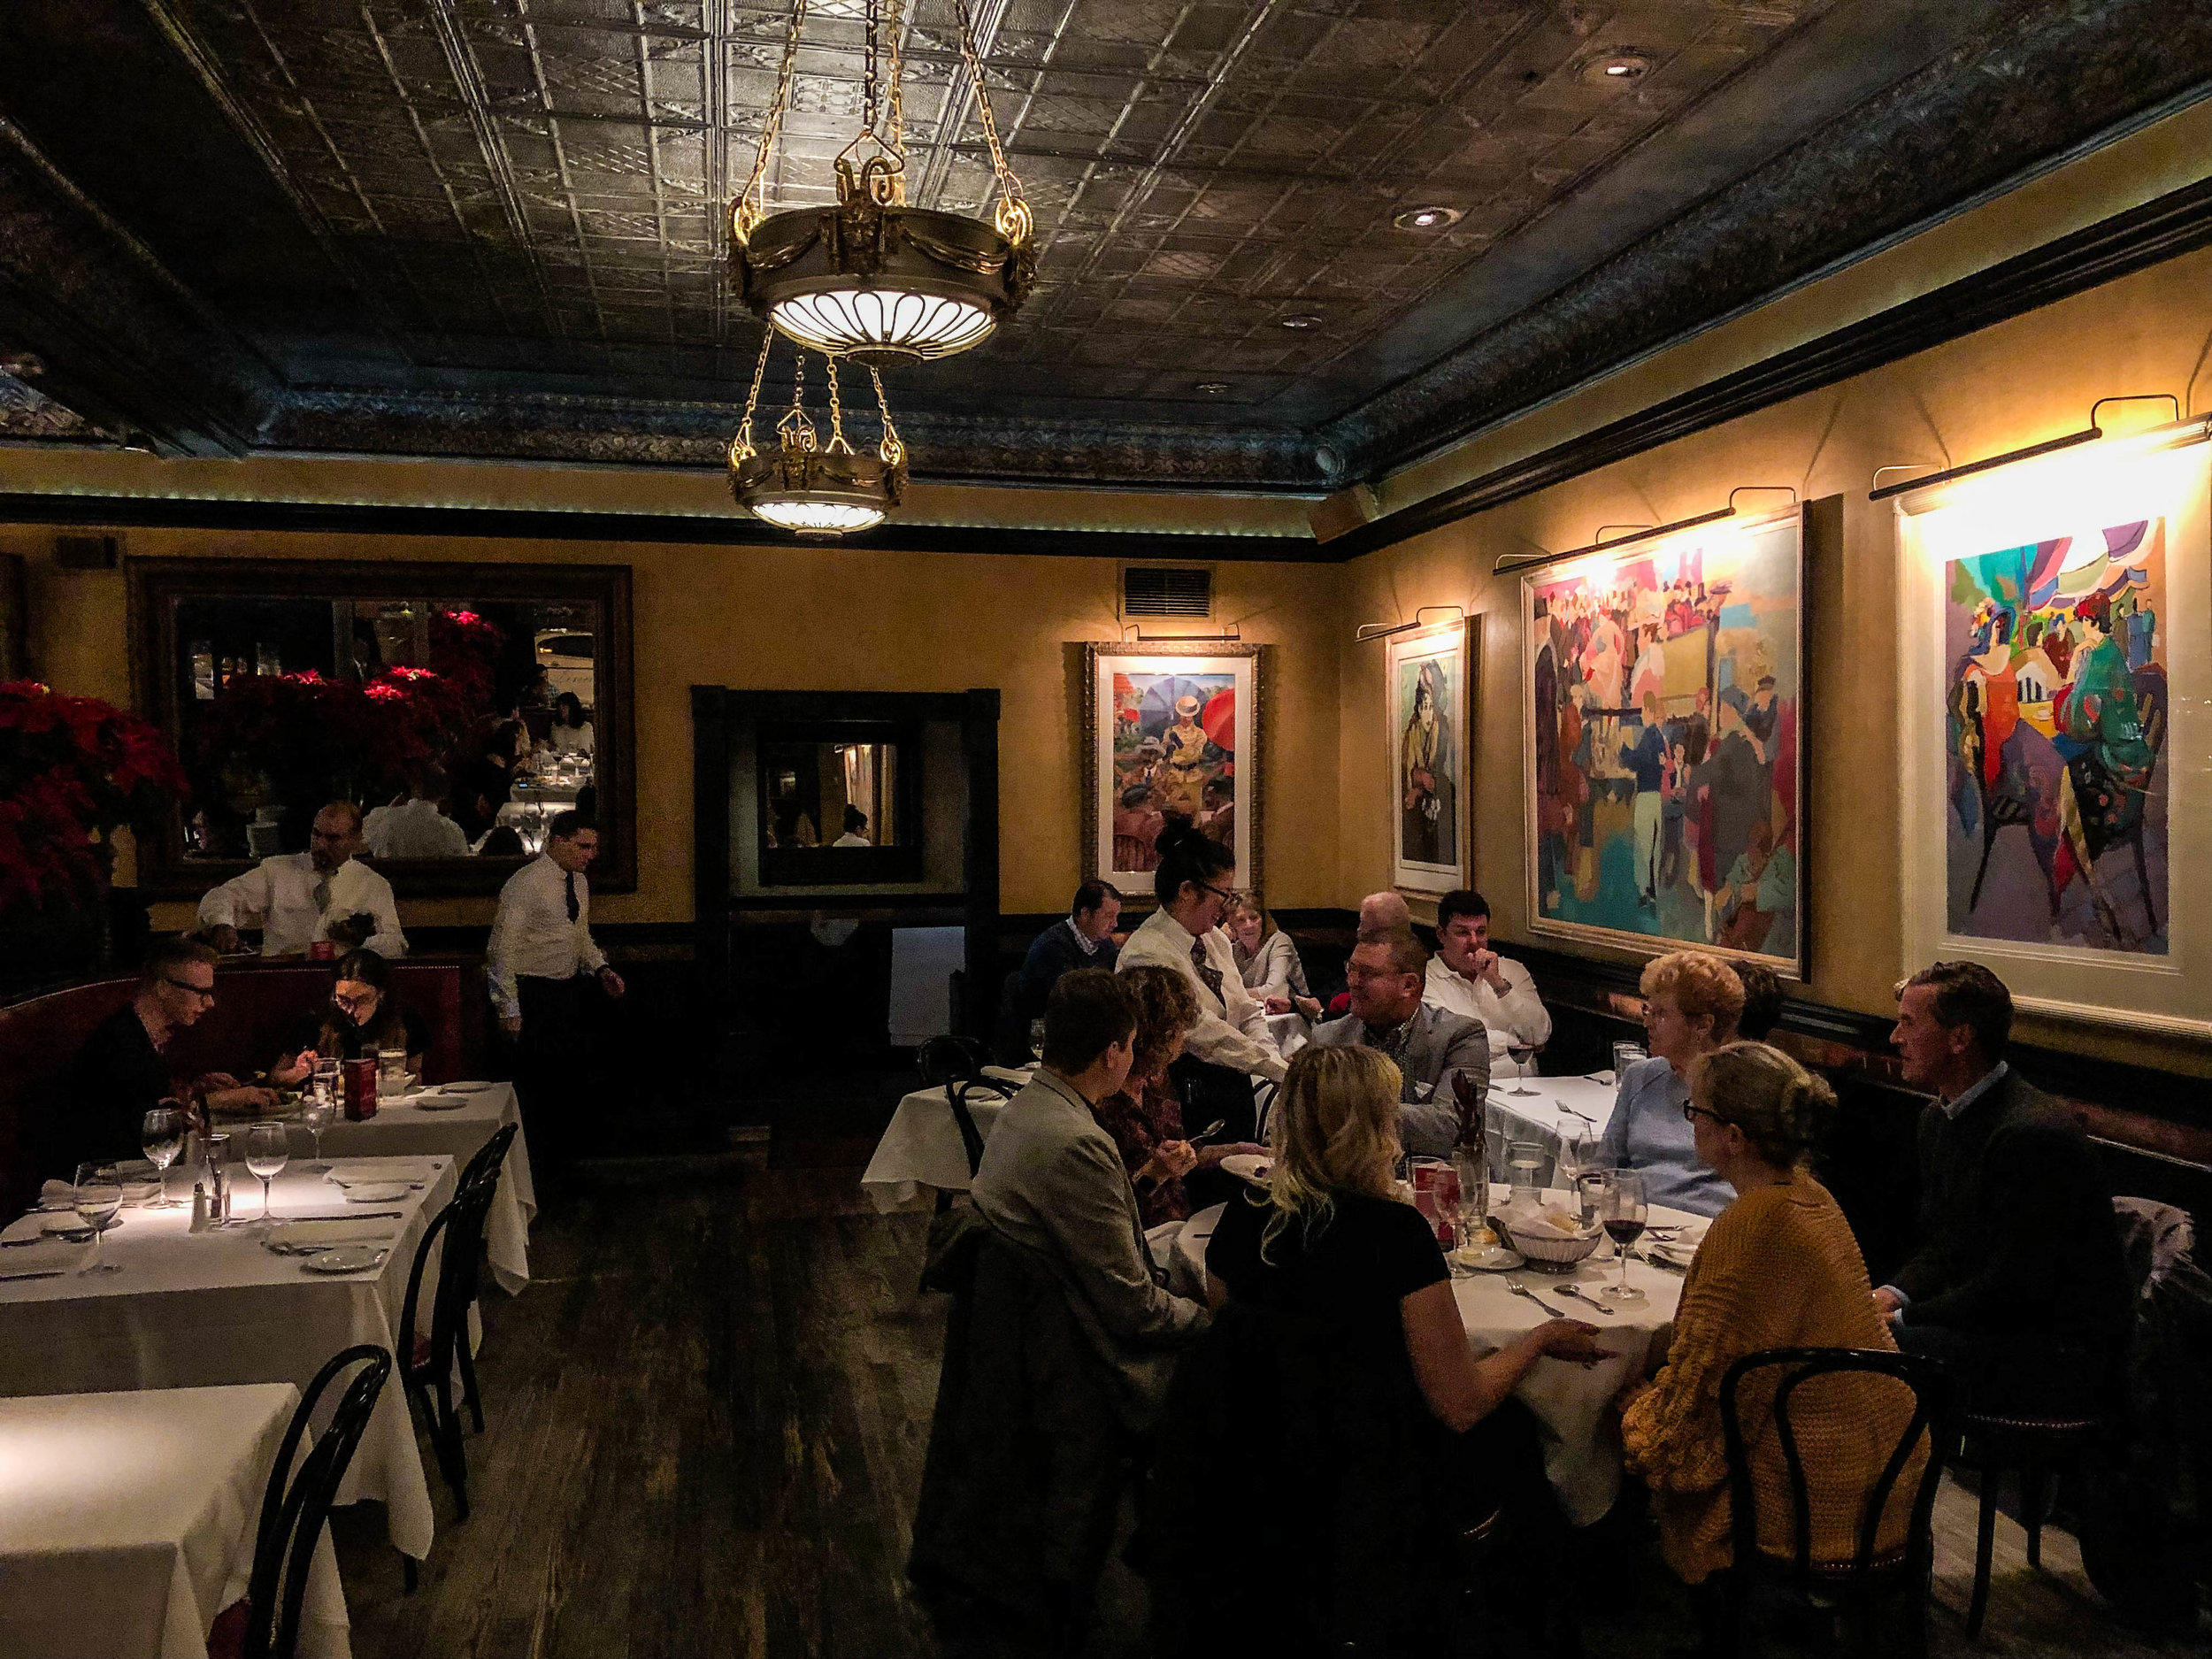 lindey's-restaurant-columbus-3.jpg